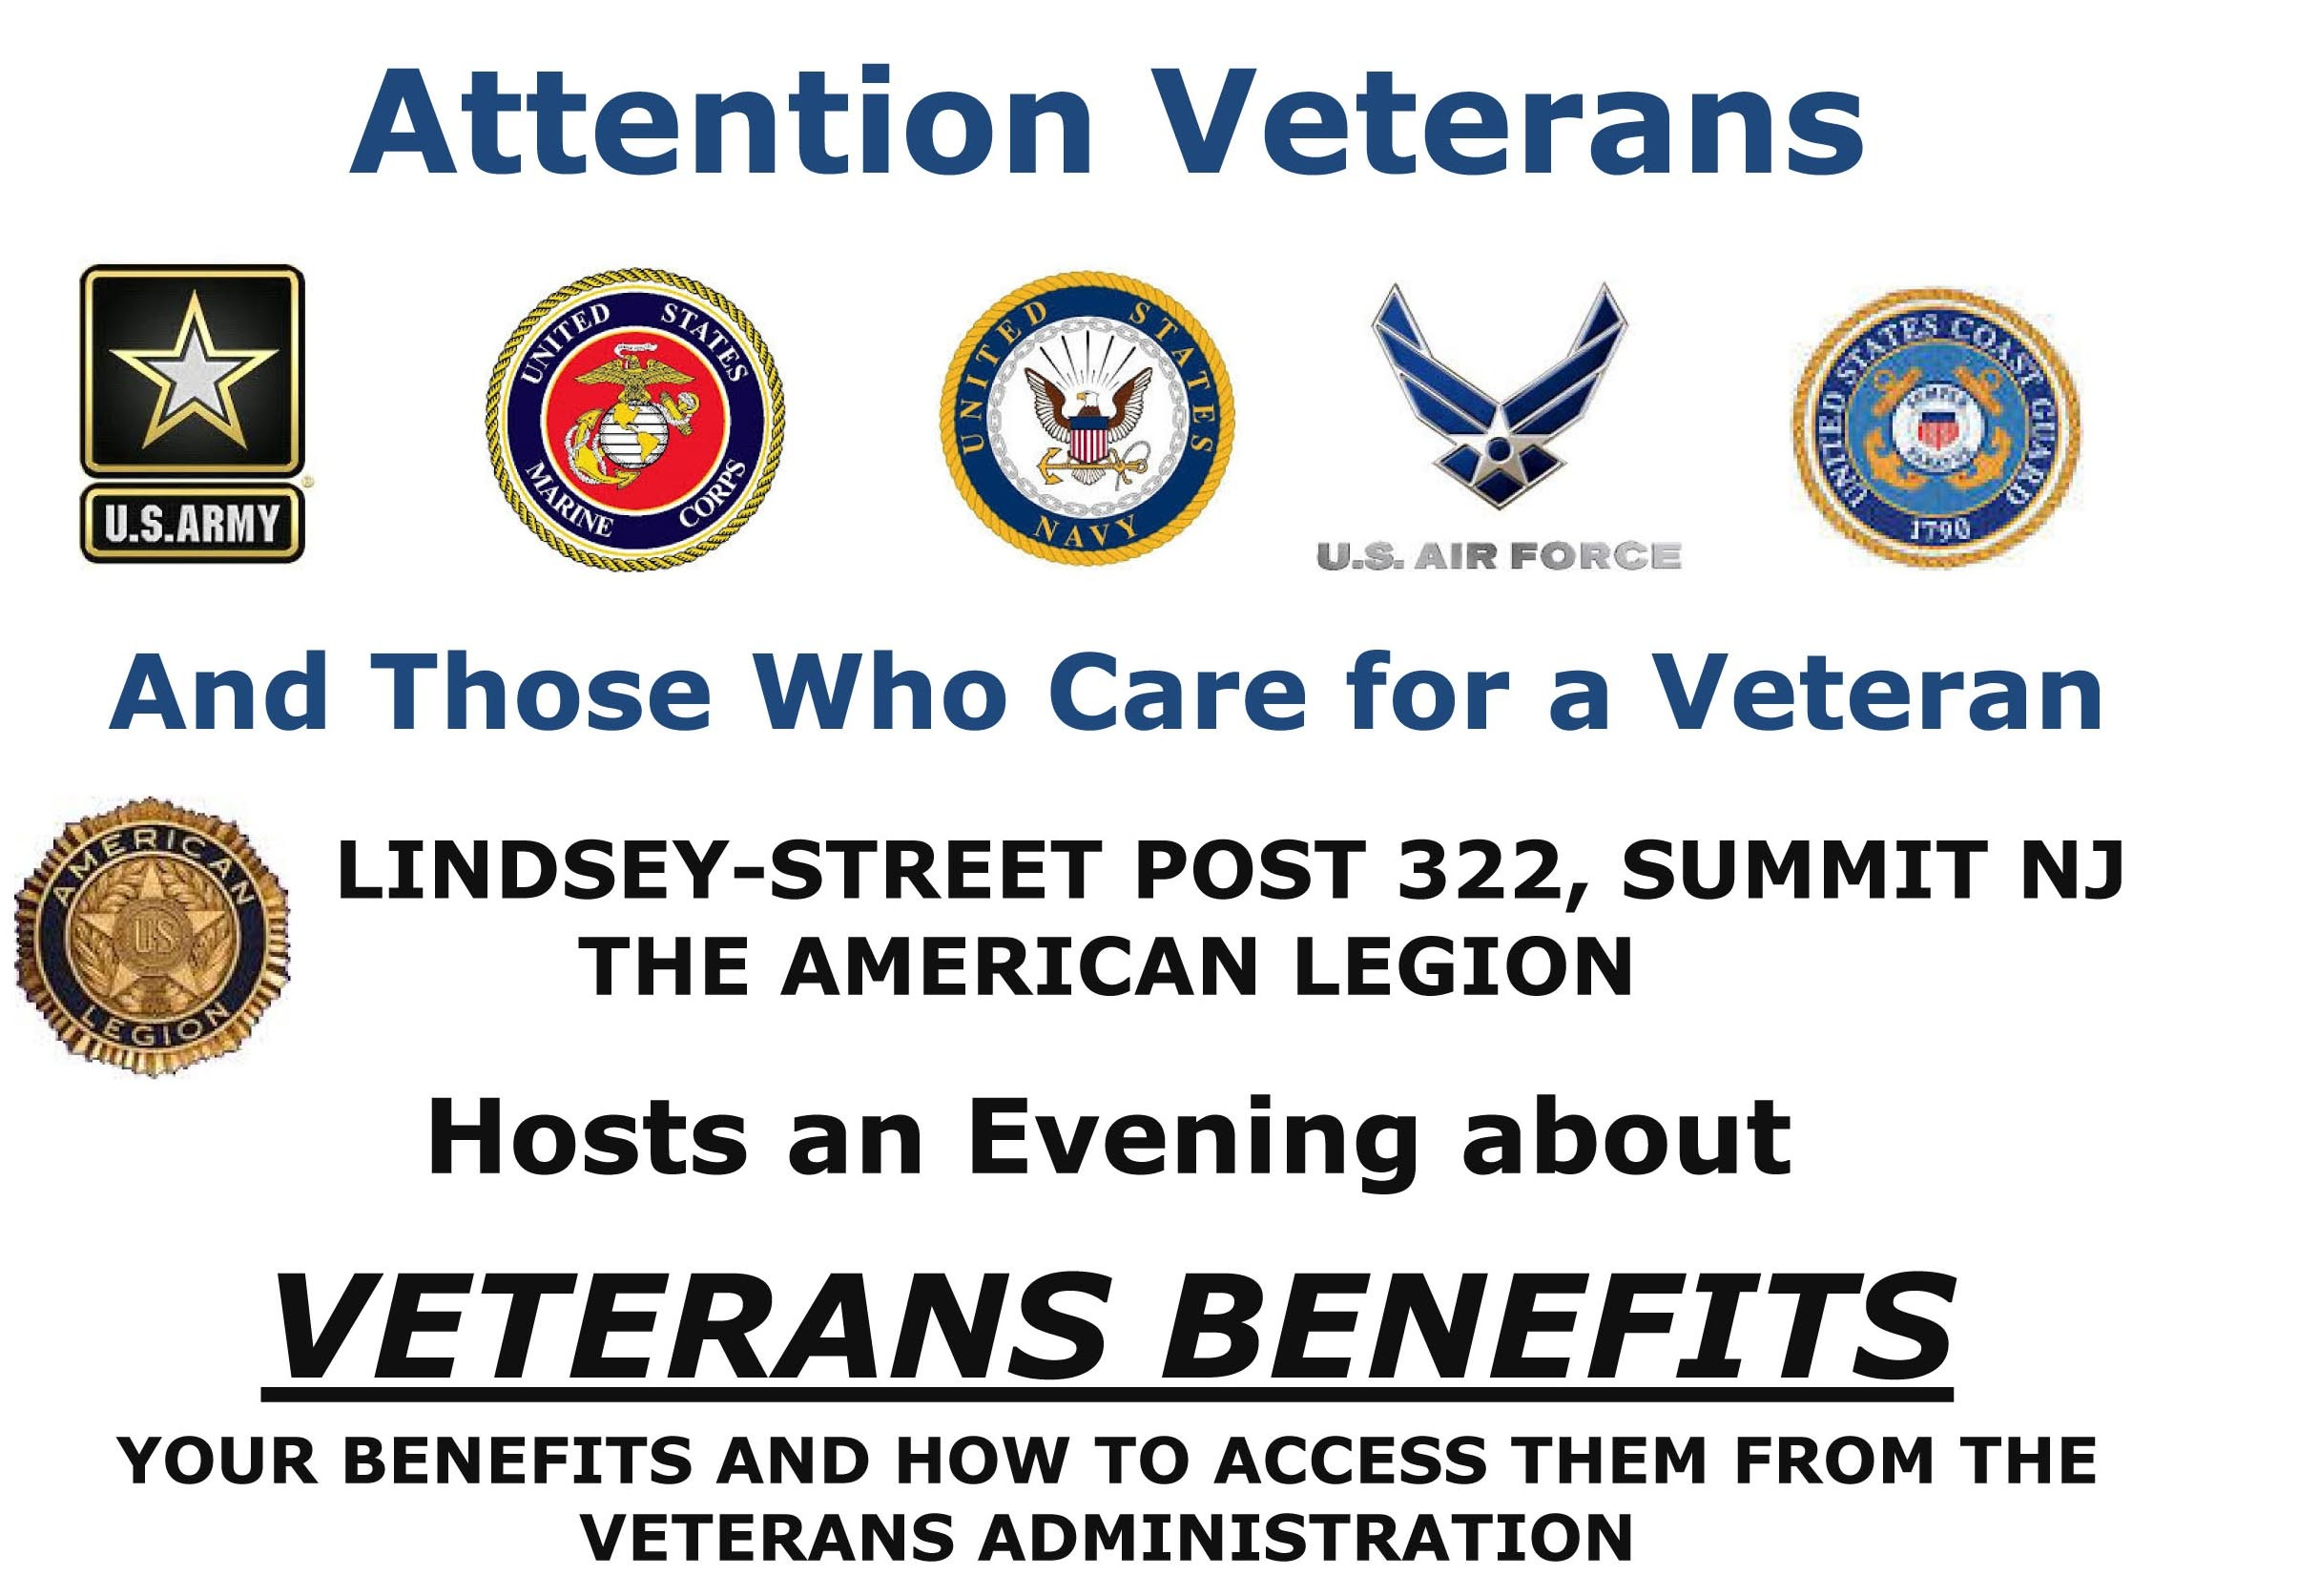 5a8c307b37ec25873ade_veteran_benefit_graphic.jpg